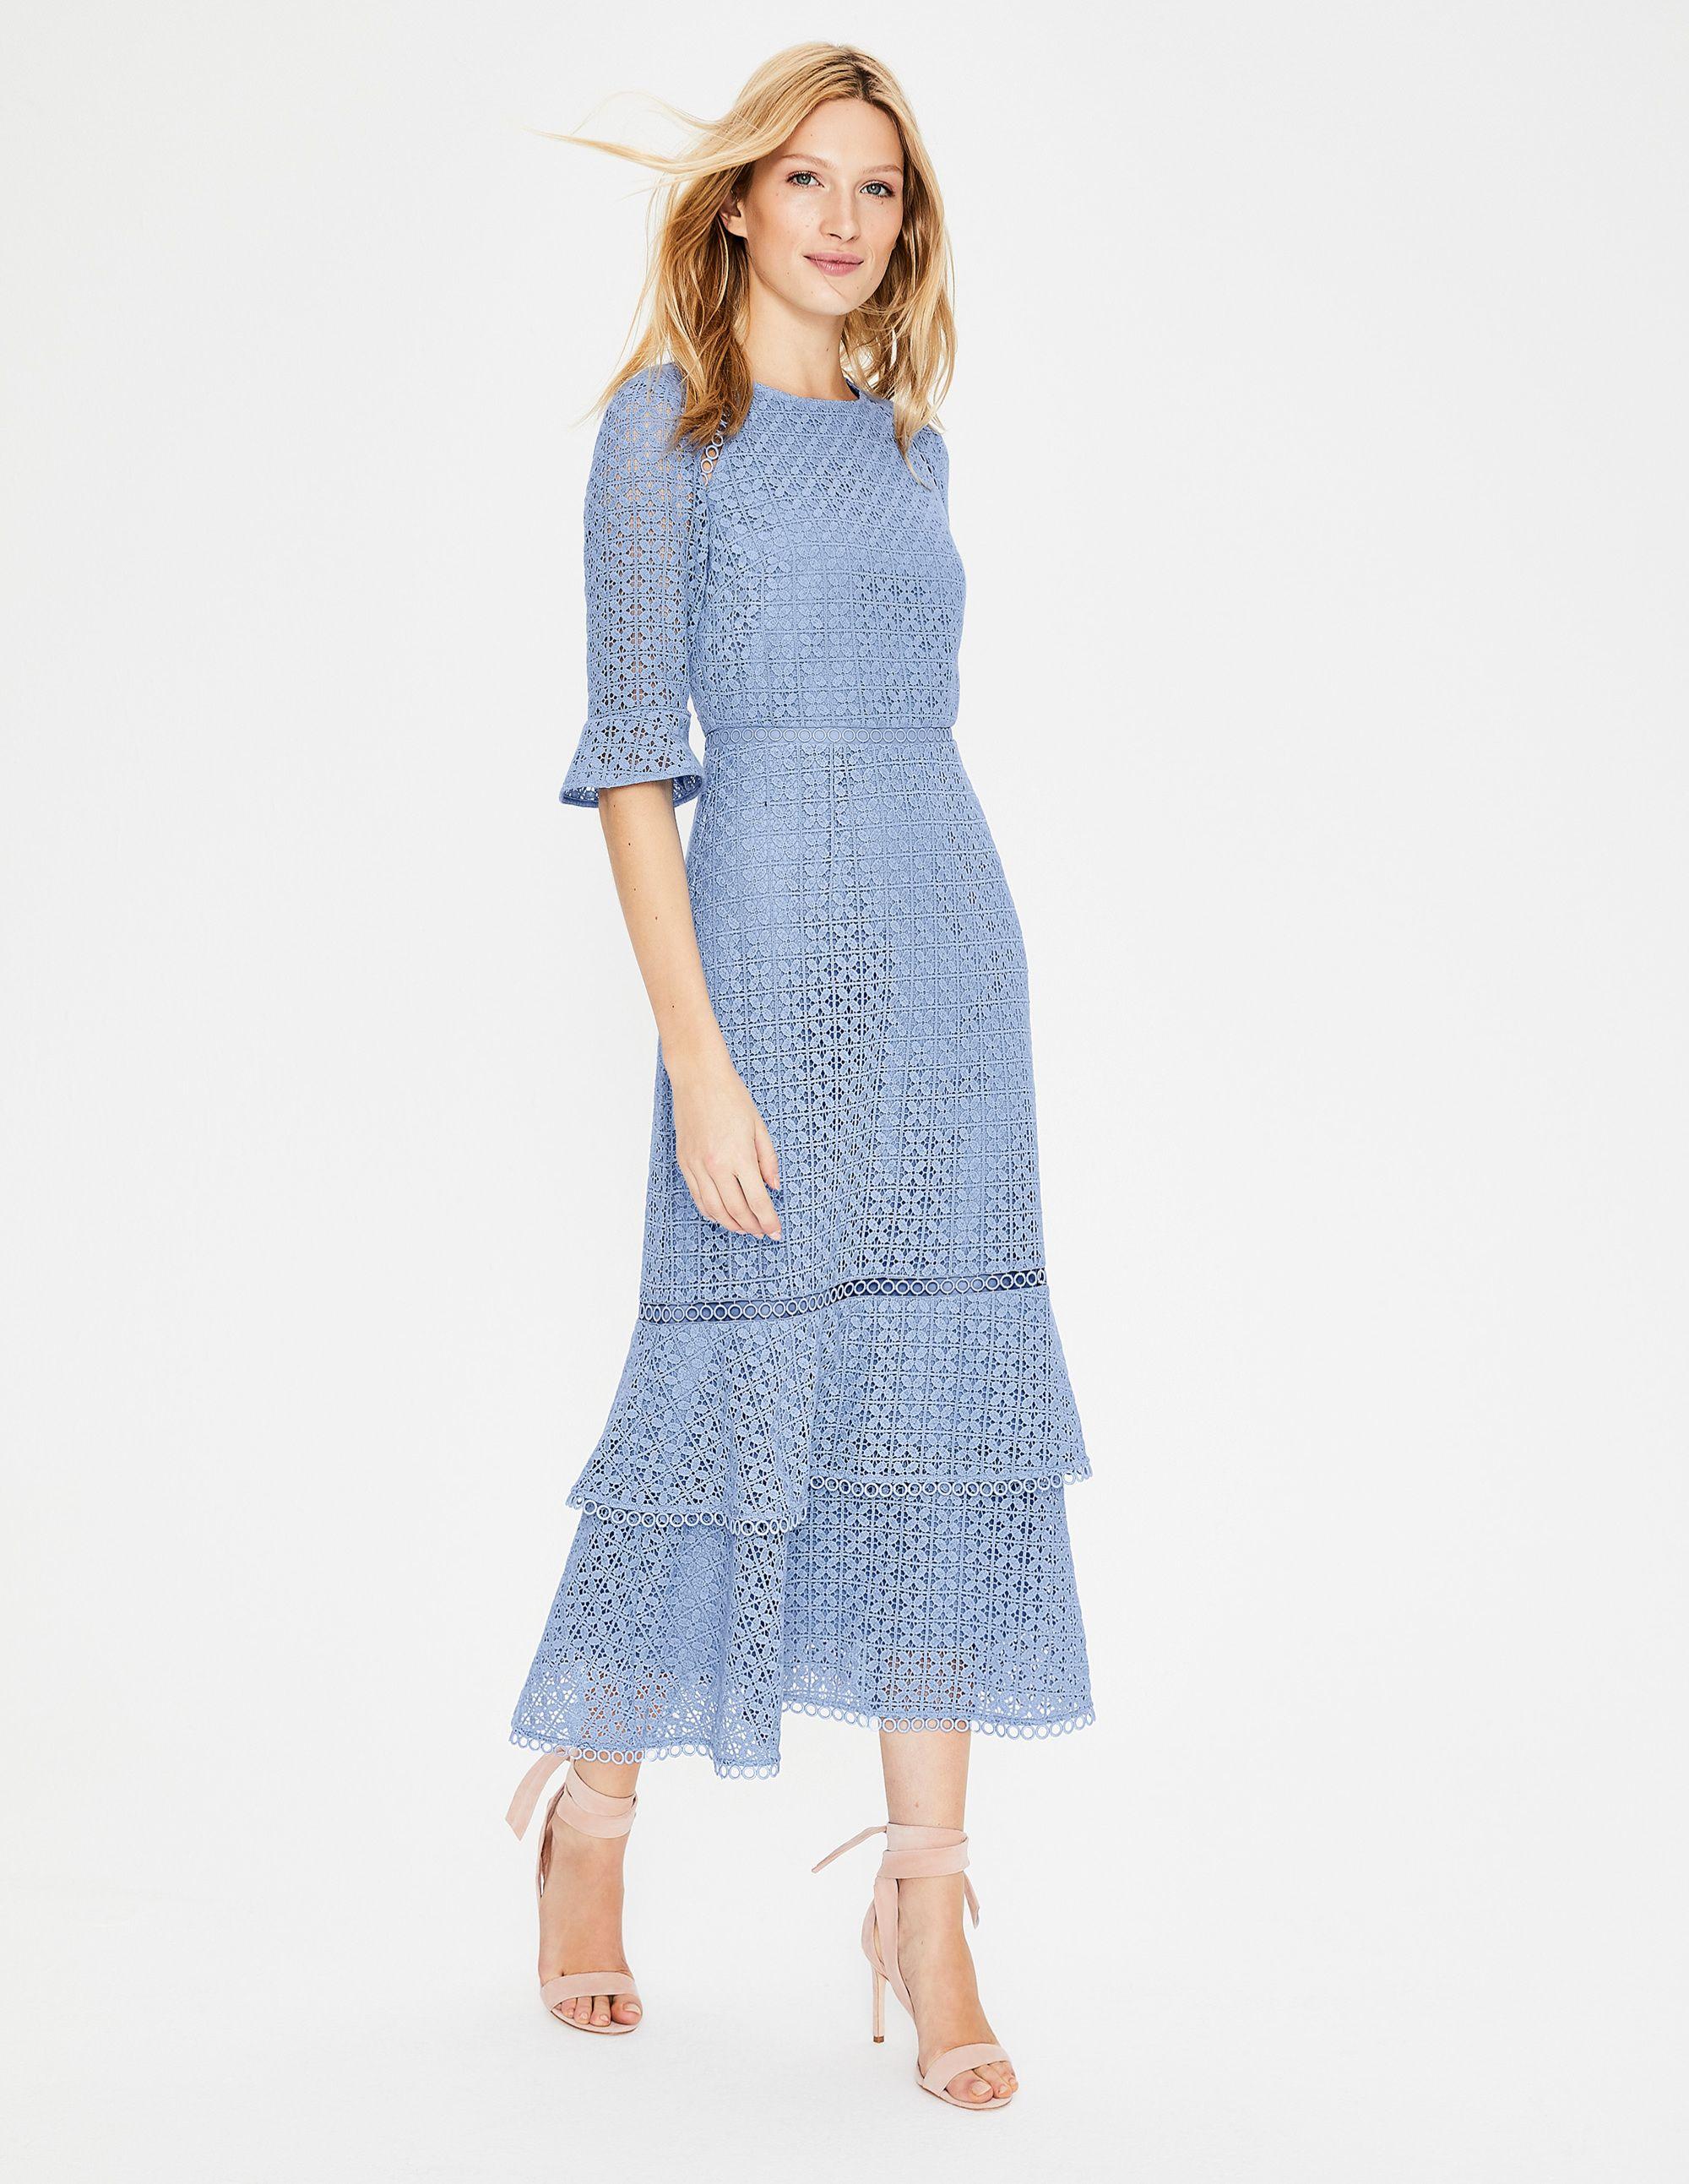 Lana Lace Midi Dress W0331 Special Occasion Dresses At Boden Womens Midi Dresses Lace Midi Dress Dresses